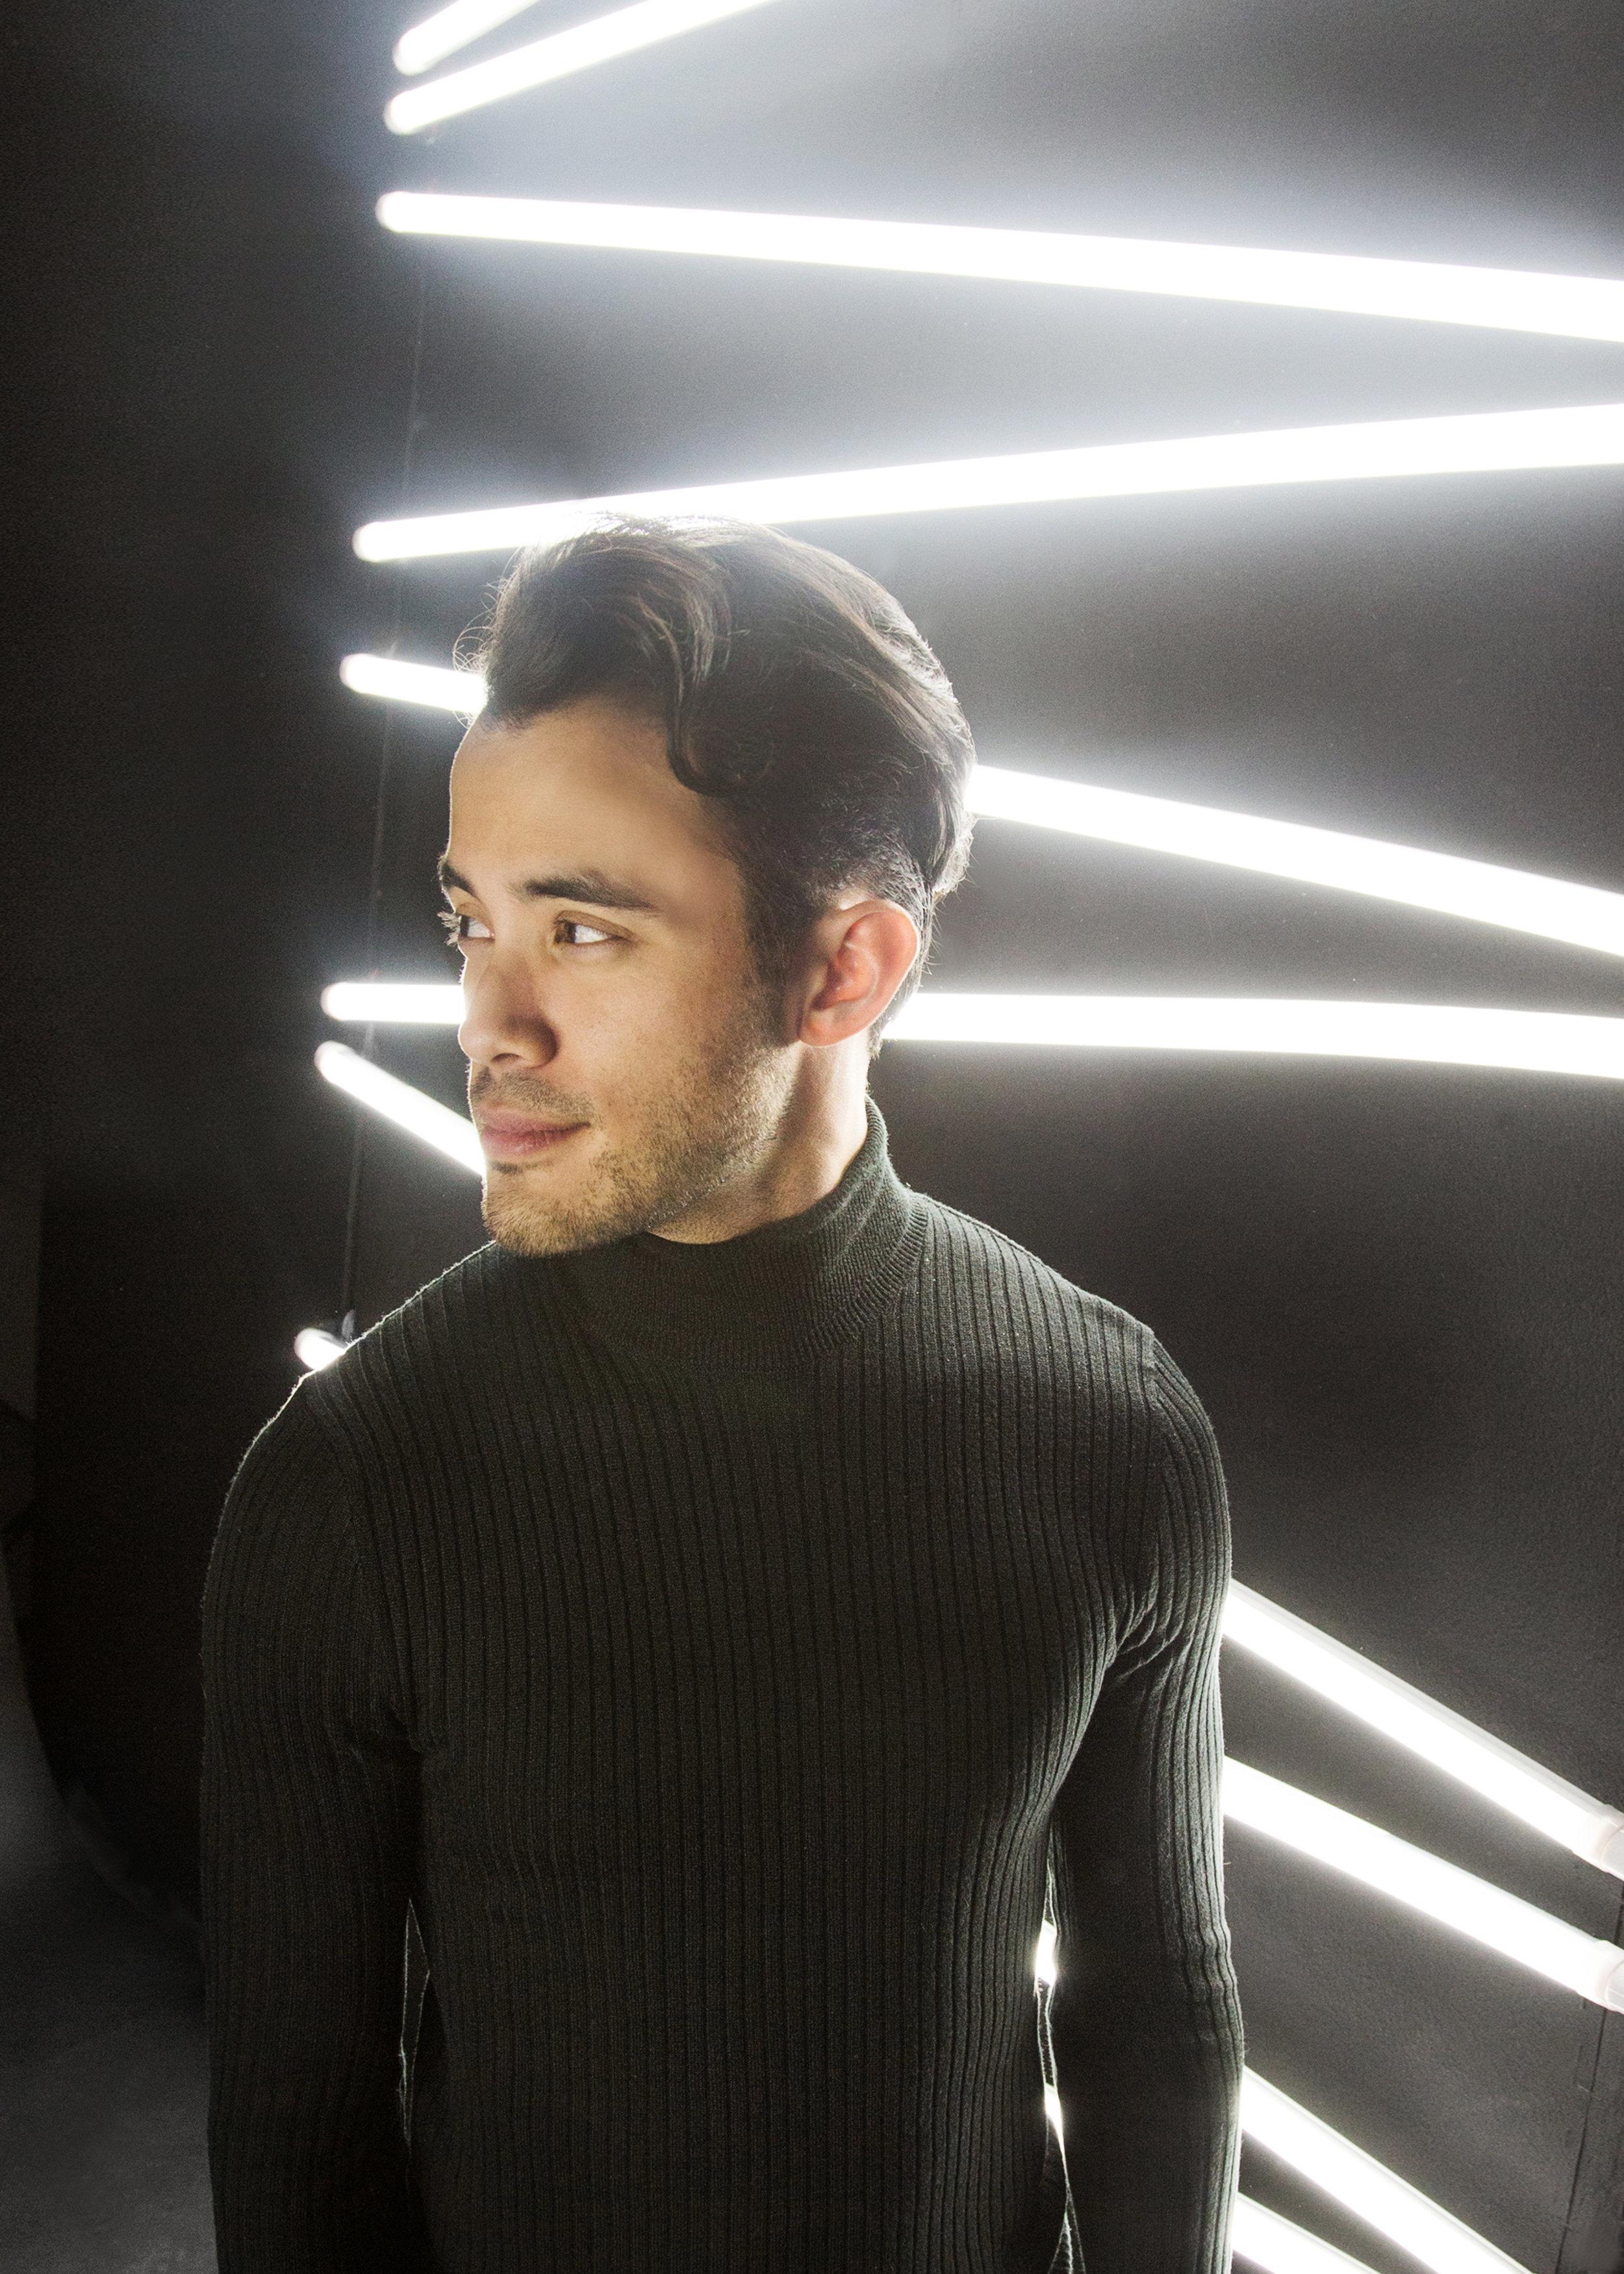 photo: Lanly le • light design: Darren Sarkin • Hair: David Dang